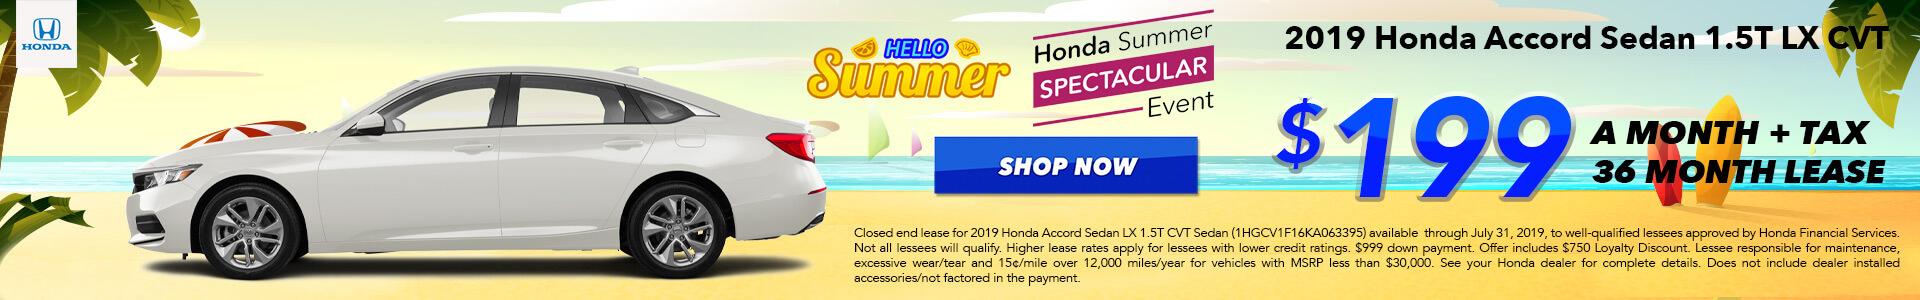 2019 Honda Accord LX Lease for $199